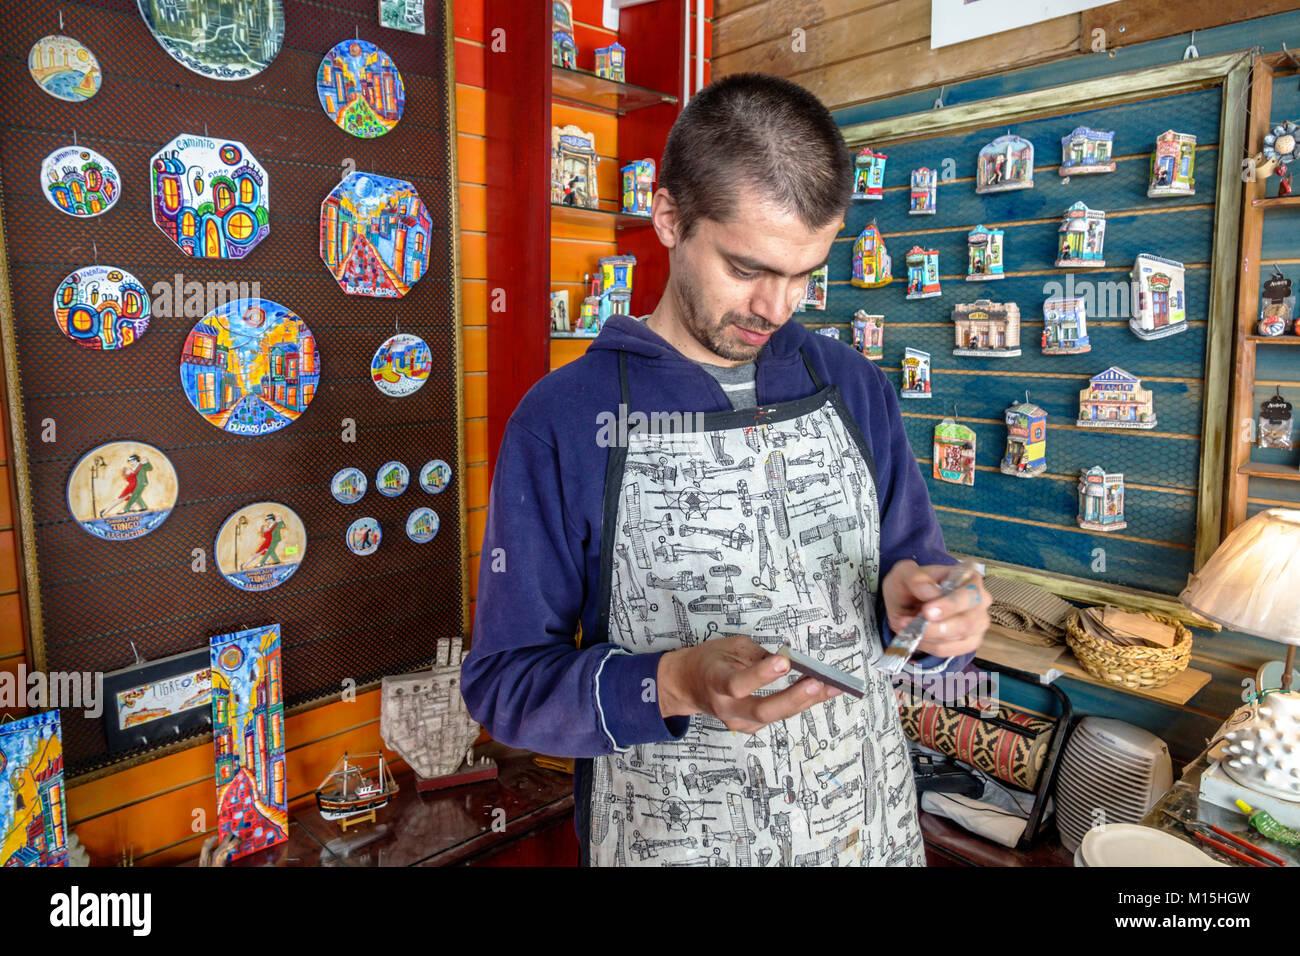 Buenos Aires Argentina Caminito Barrio de la Boca Patio Quinquela shopping arcade artisanal handicrafts souvenirs - Stock Image